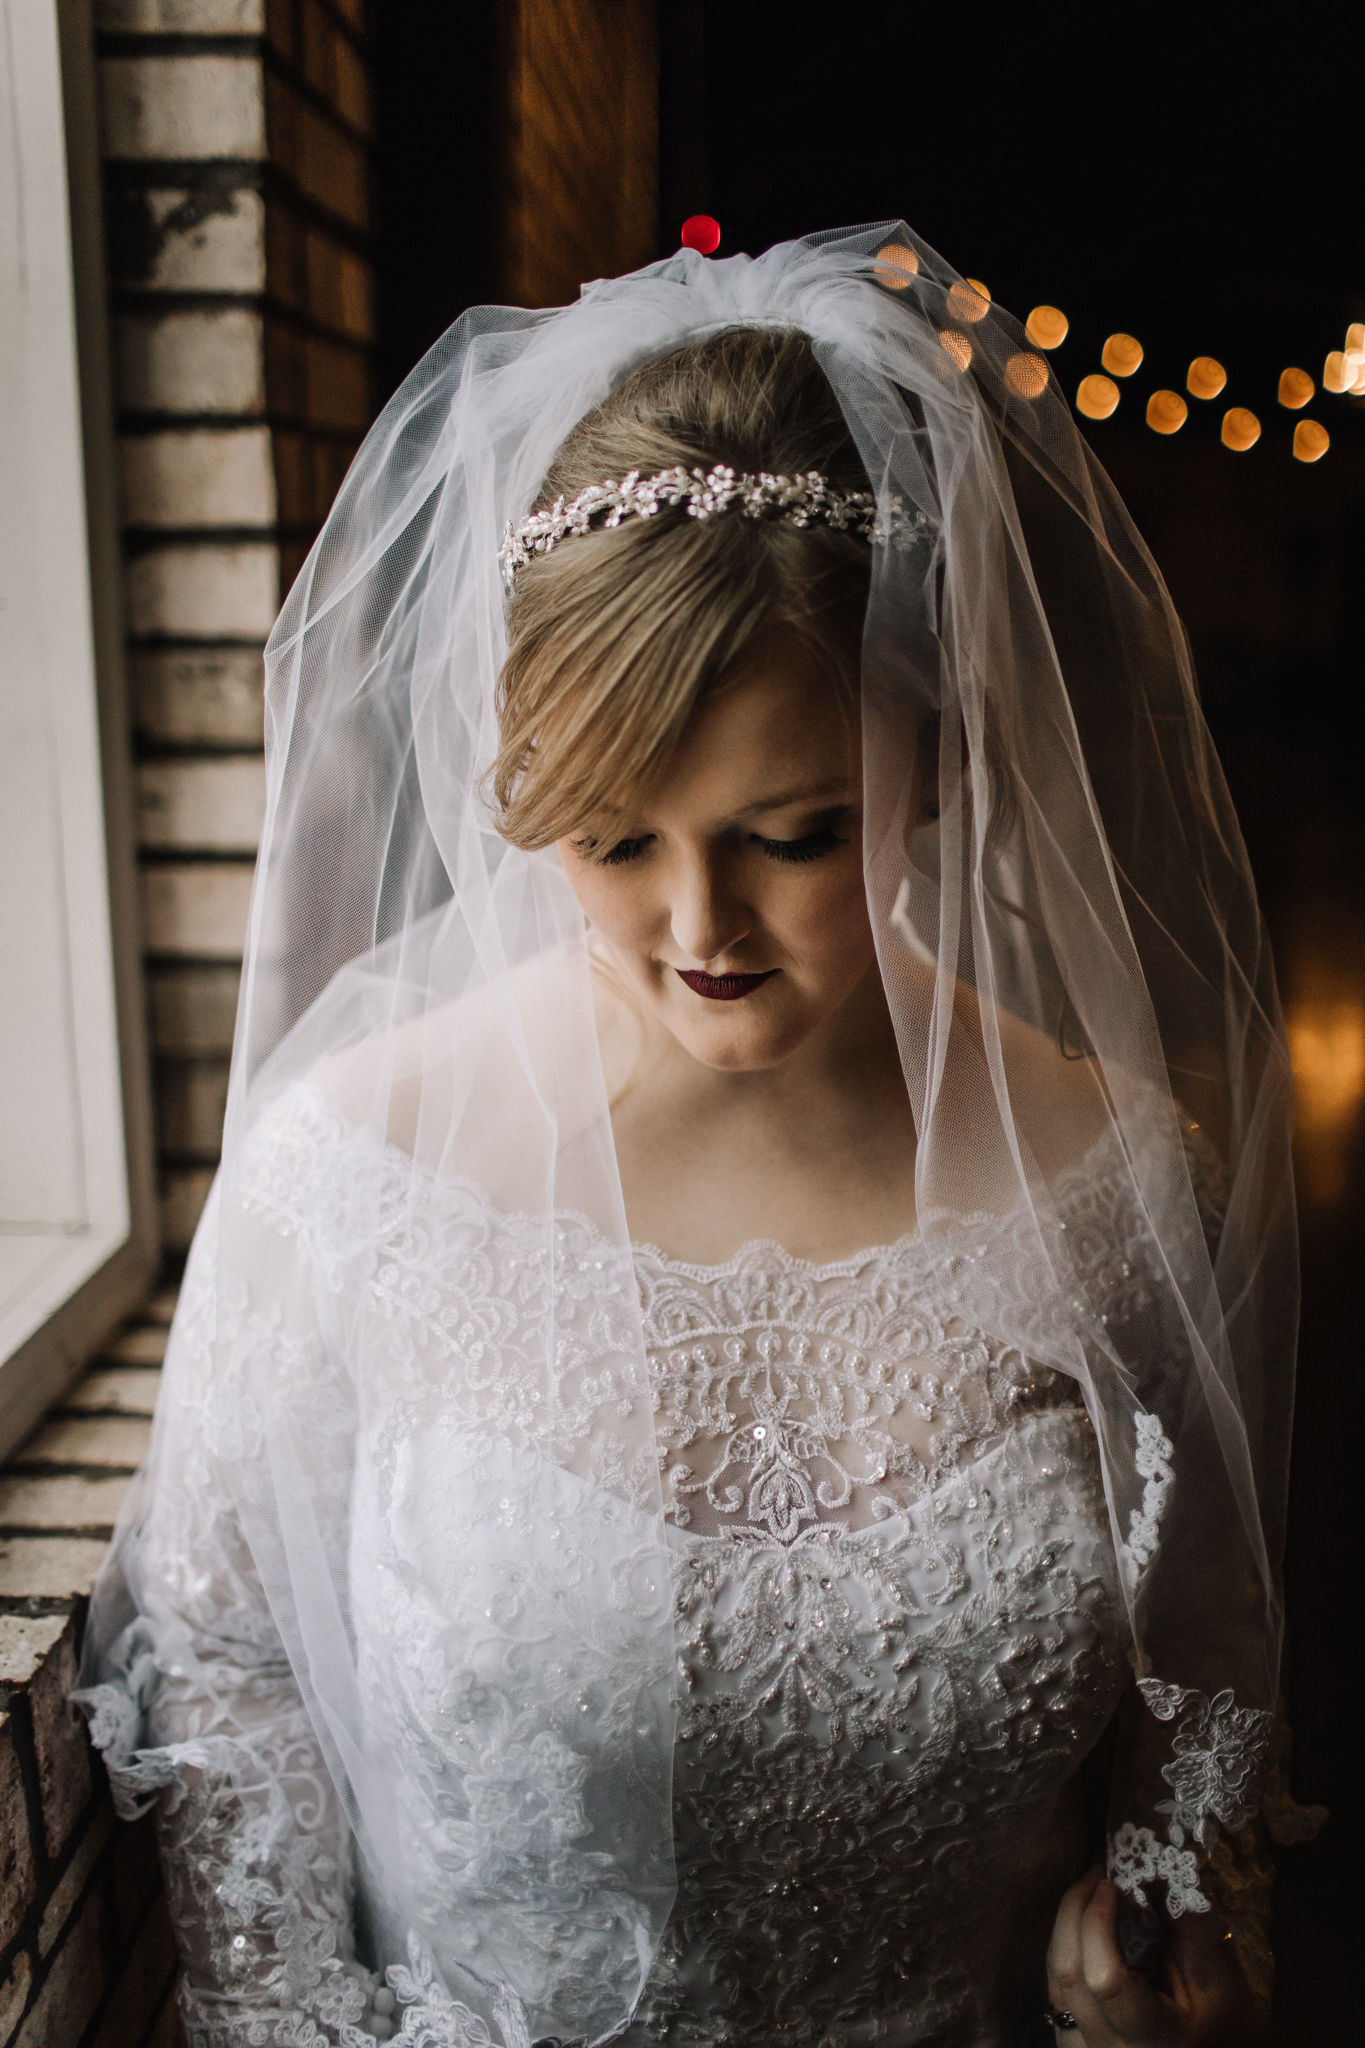 billie-shaye-style-photography-www.billieshayestyle.com-winter-wedding-the-belle-hollow-clarksville-tennessee-9483.jpg